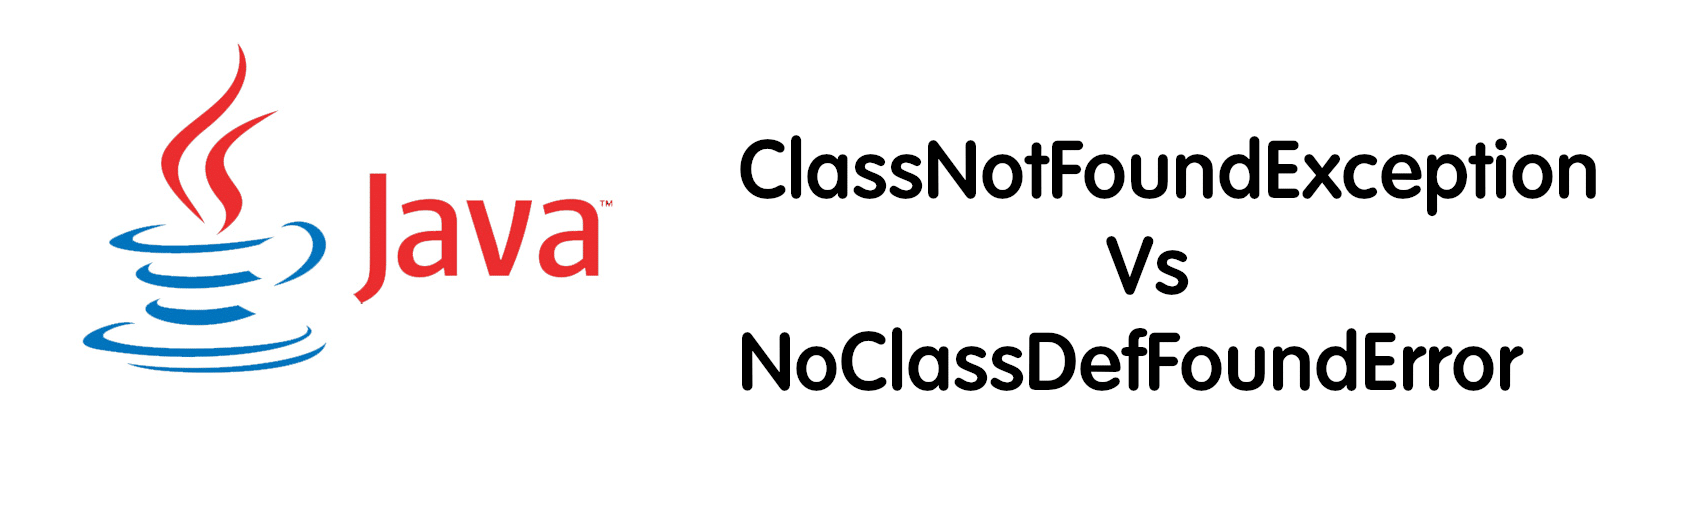 ClassNotFoundException Vs NoClassDefFoundError